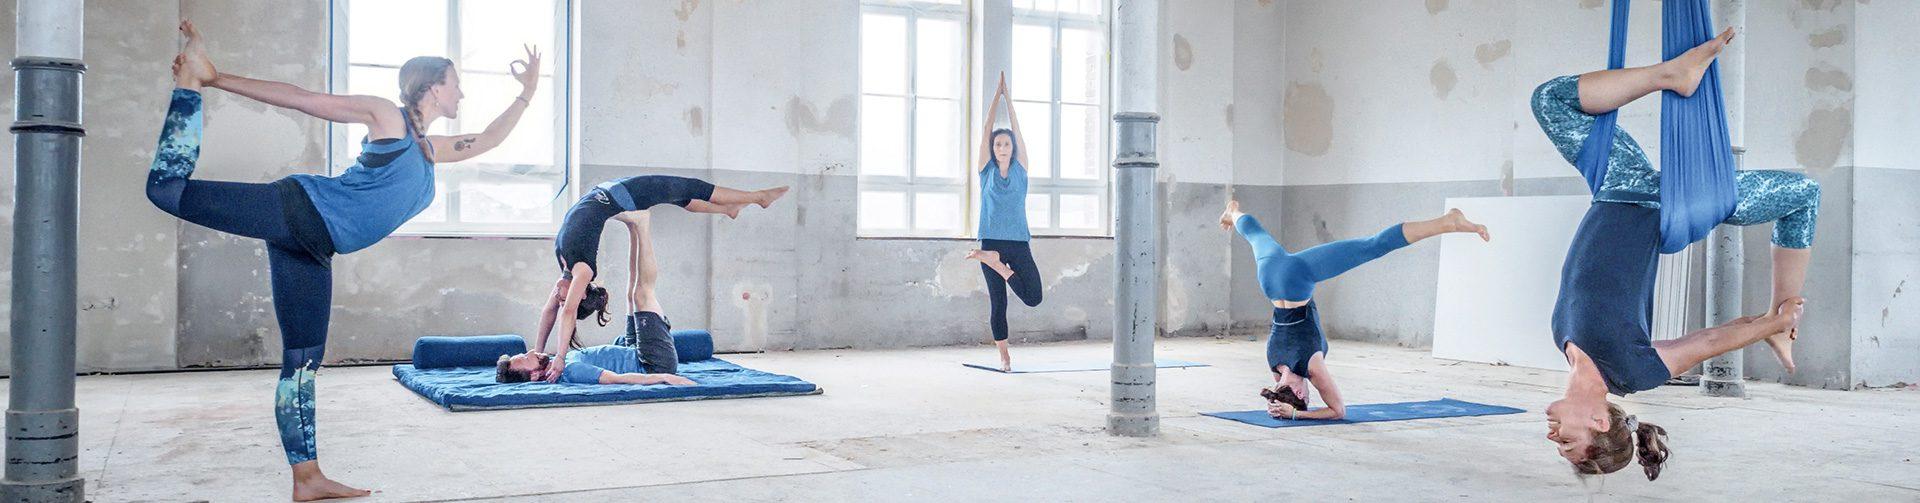 Yoga - Blaue Stunde Fulda